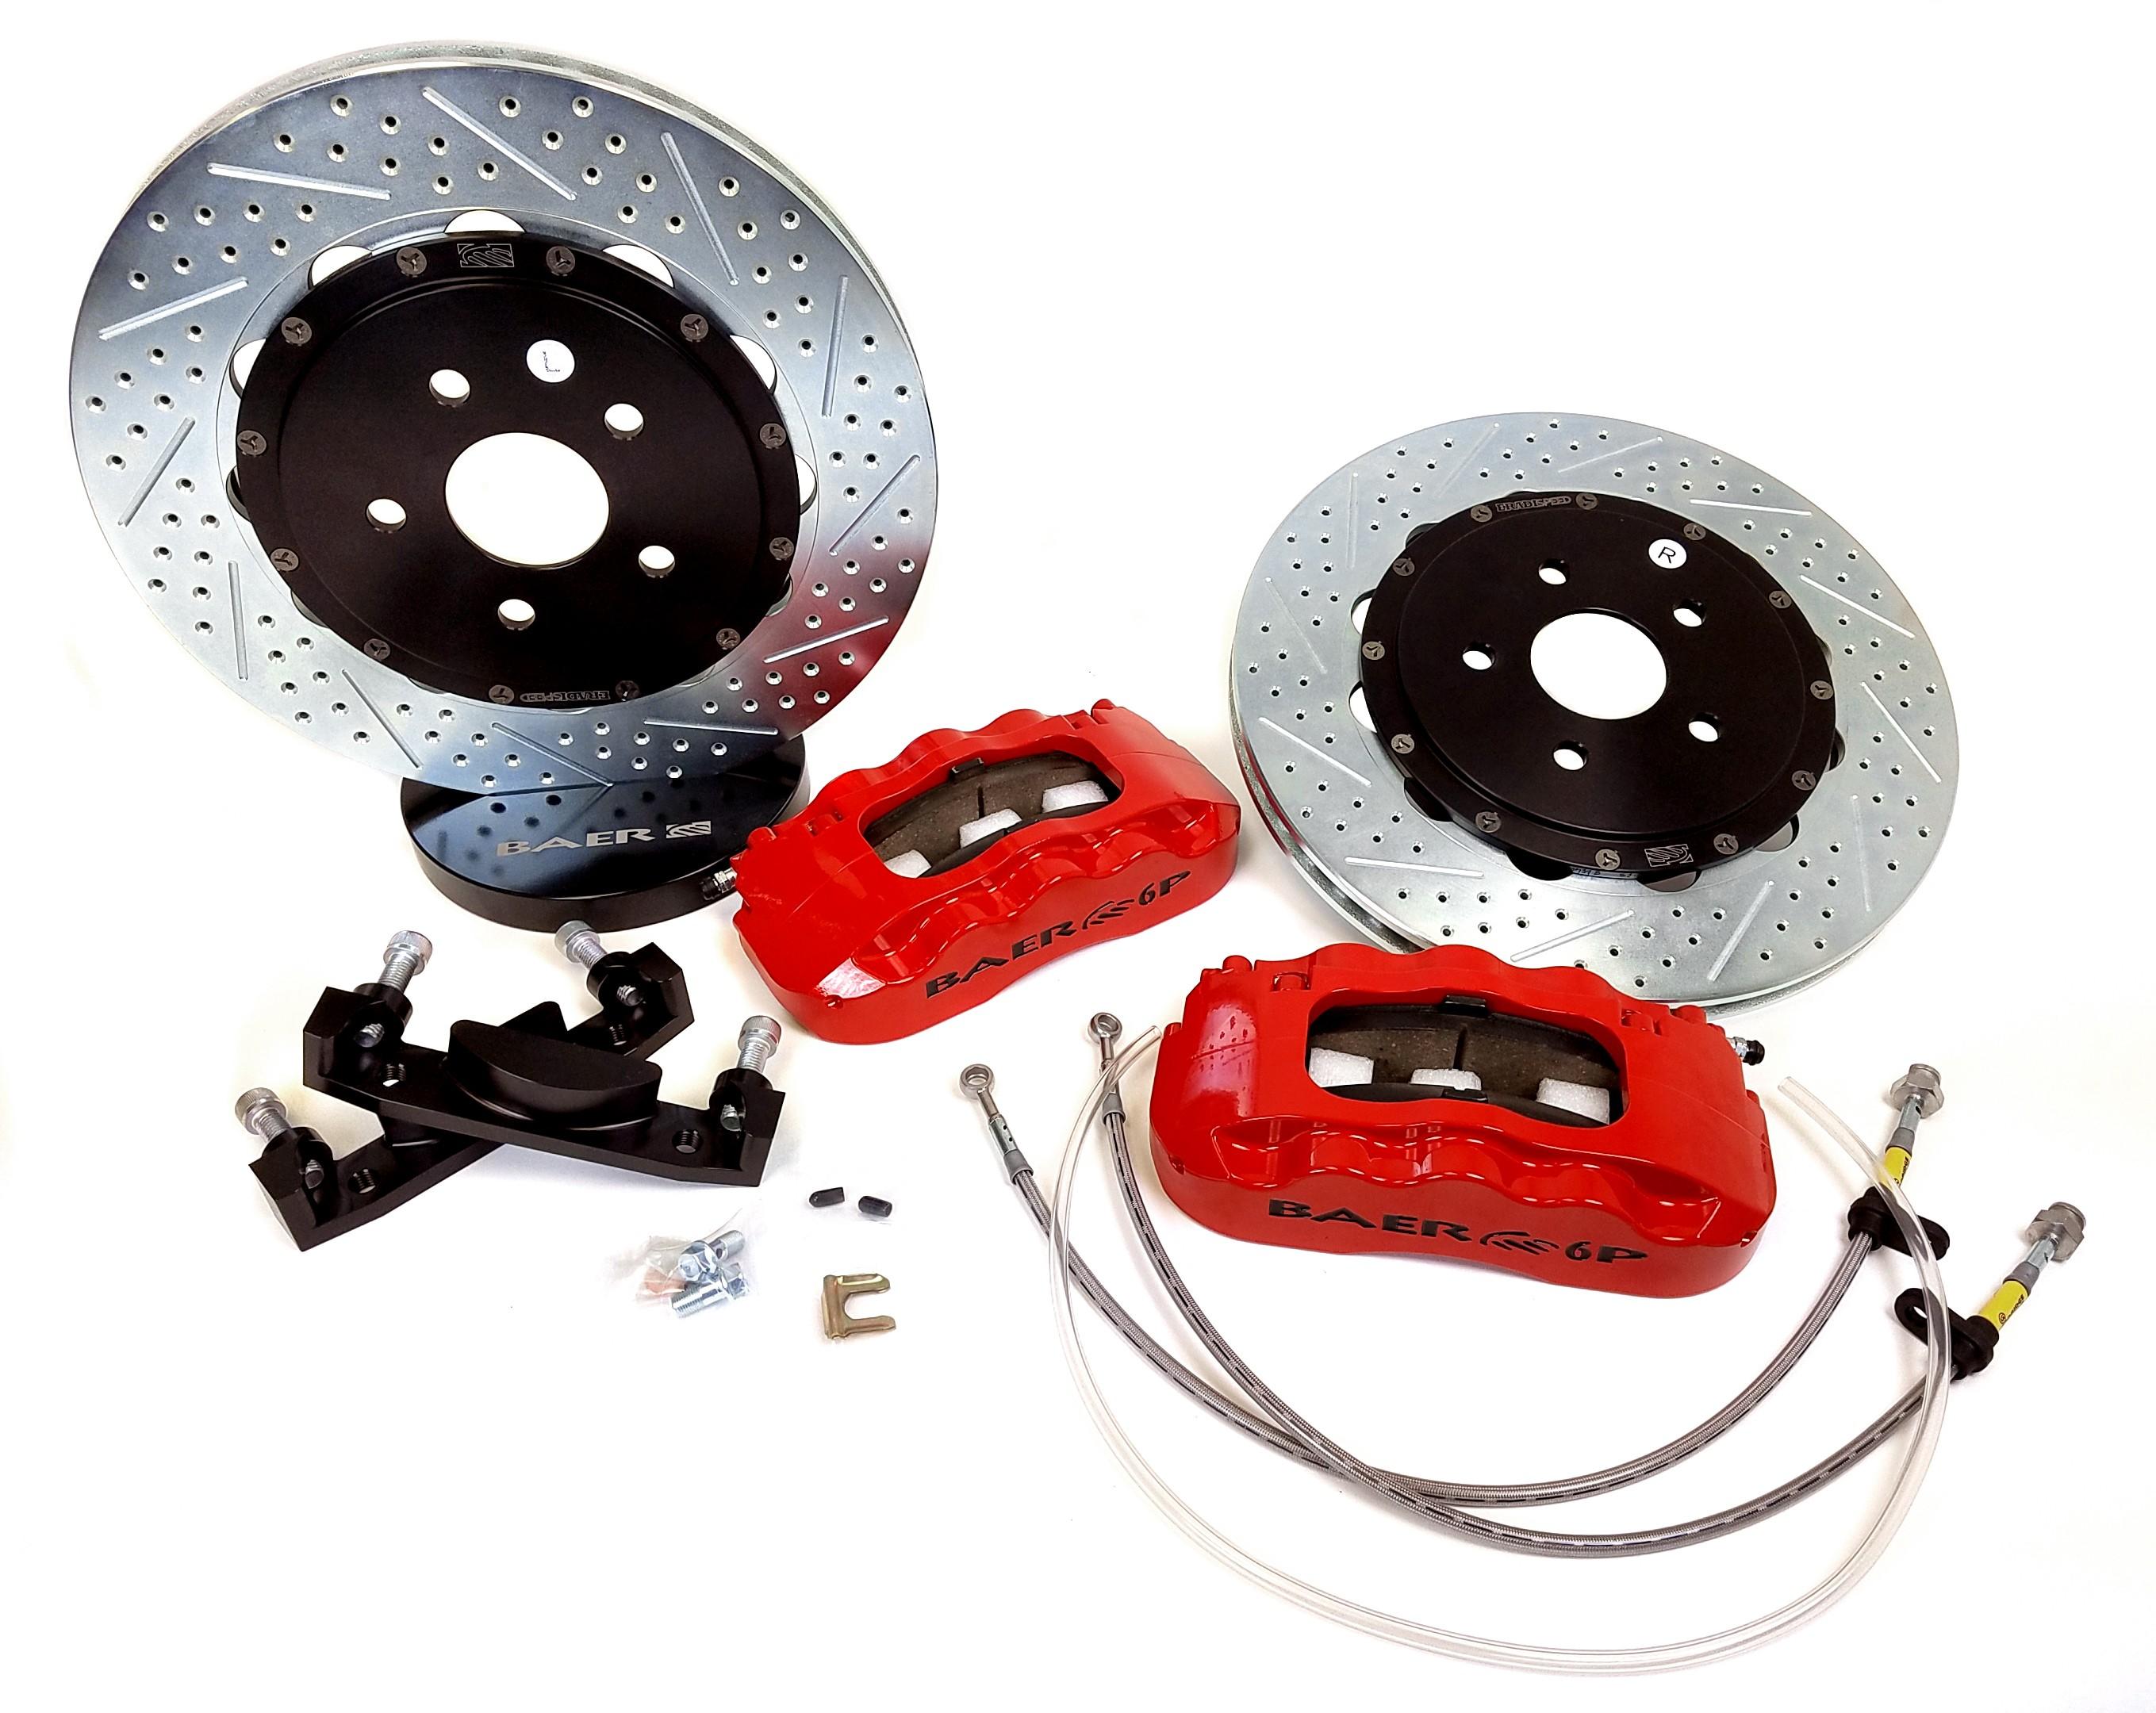 14 Rear Pro+ w//Park Brake Silver 65-70 Chevy Full Size Car 1 Pack BAER BRAKES 4302422S-BKCZ Brake System